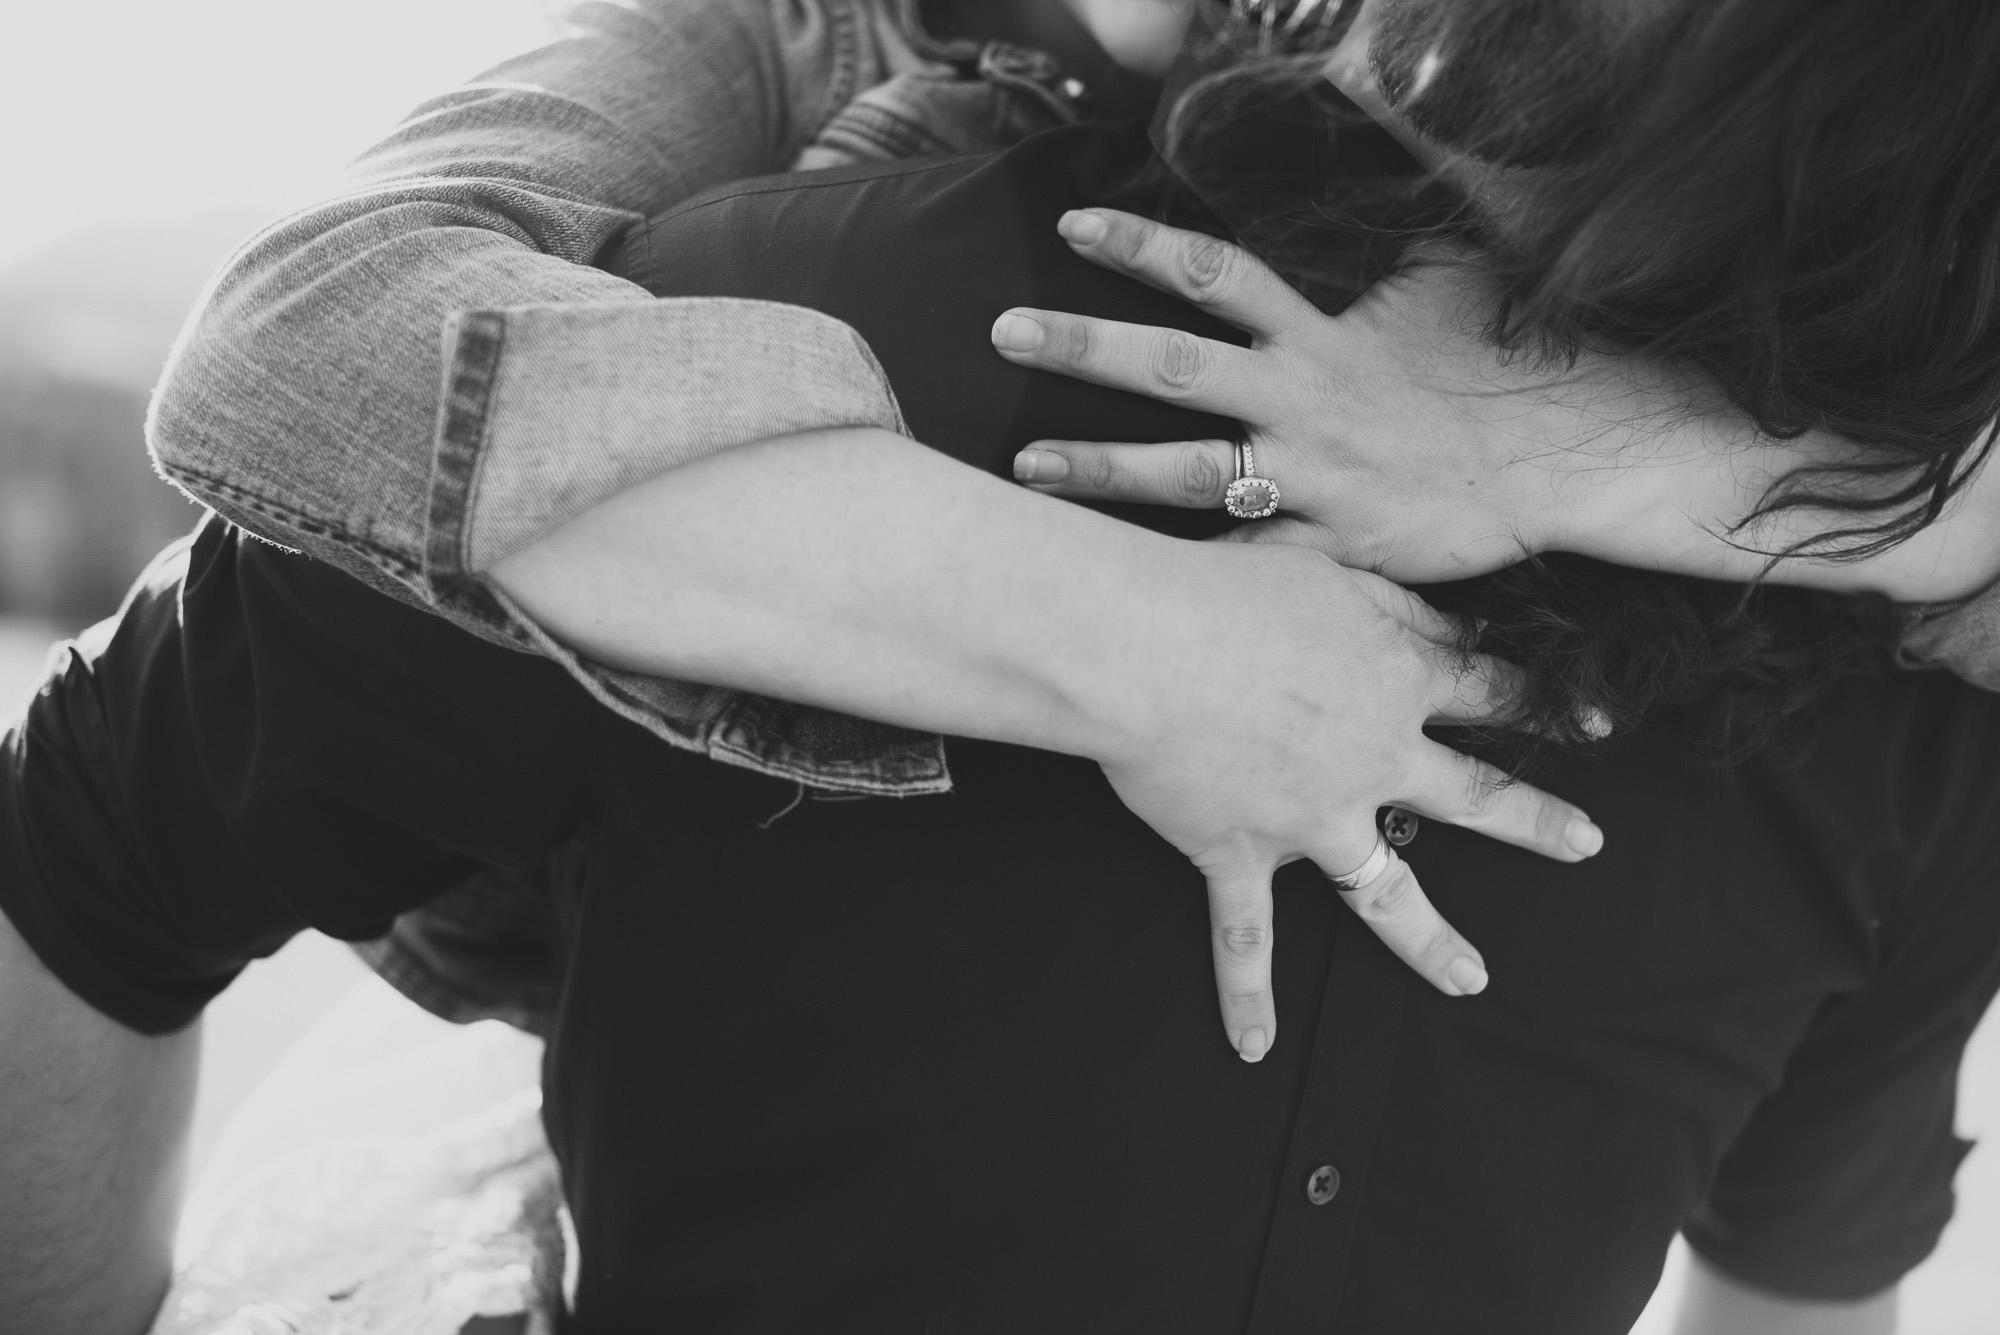 53-32couple-anniversary-engagement-photographer-colorado-romantic-photos-mountain-wedding-photographer-trevr&marissa-2016-2097.jpg